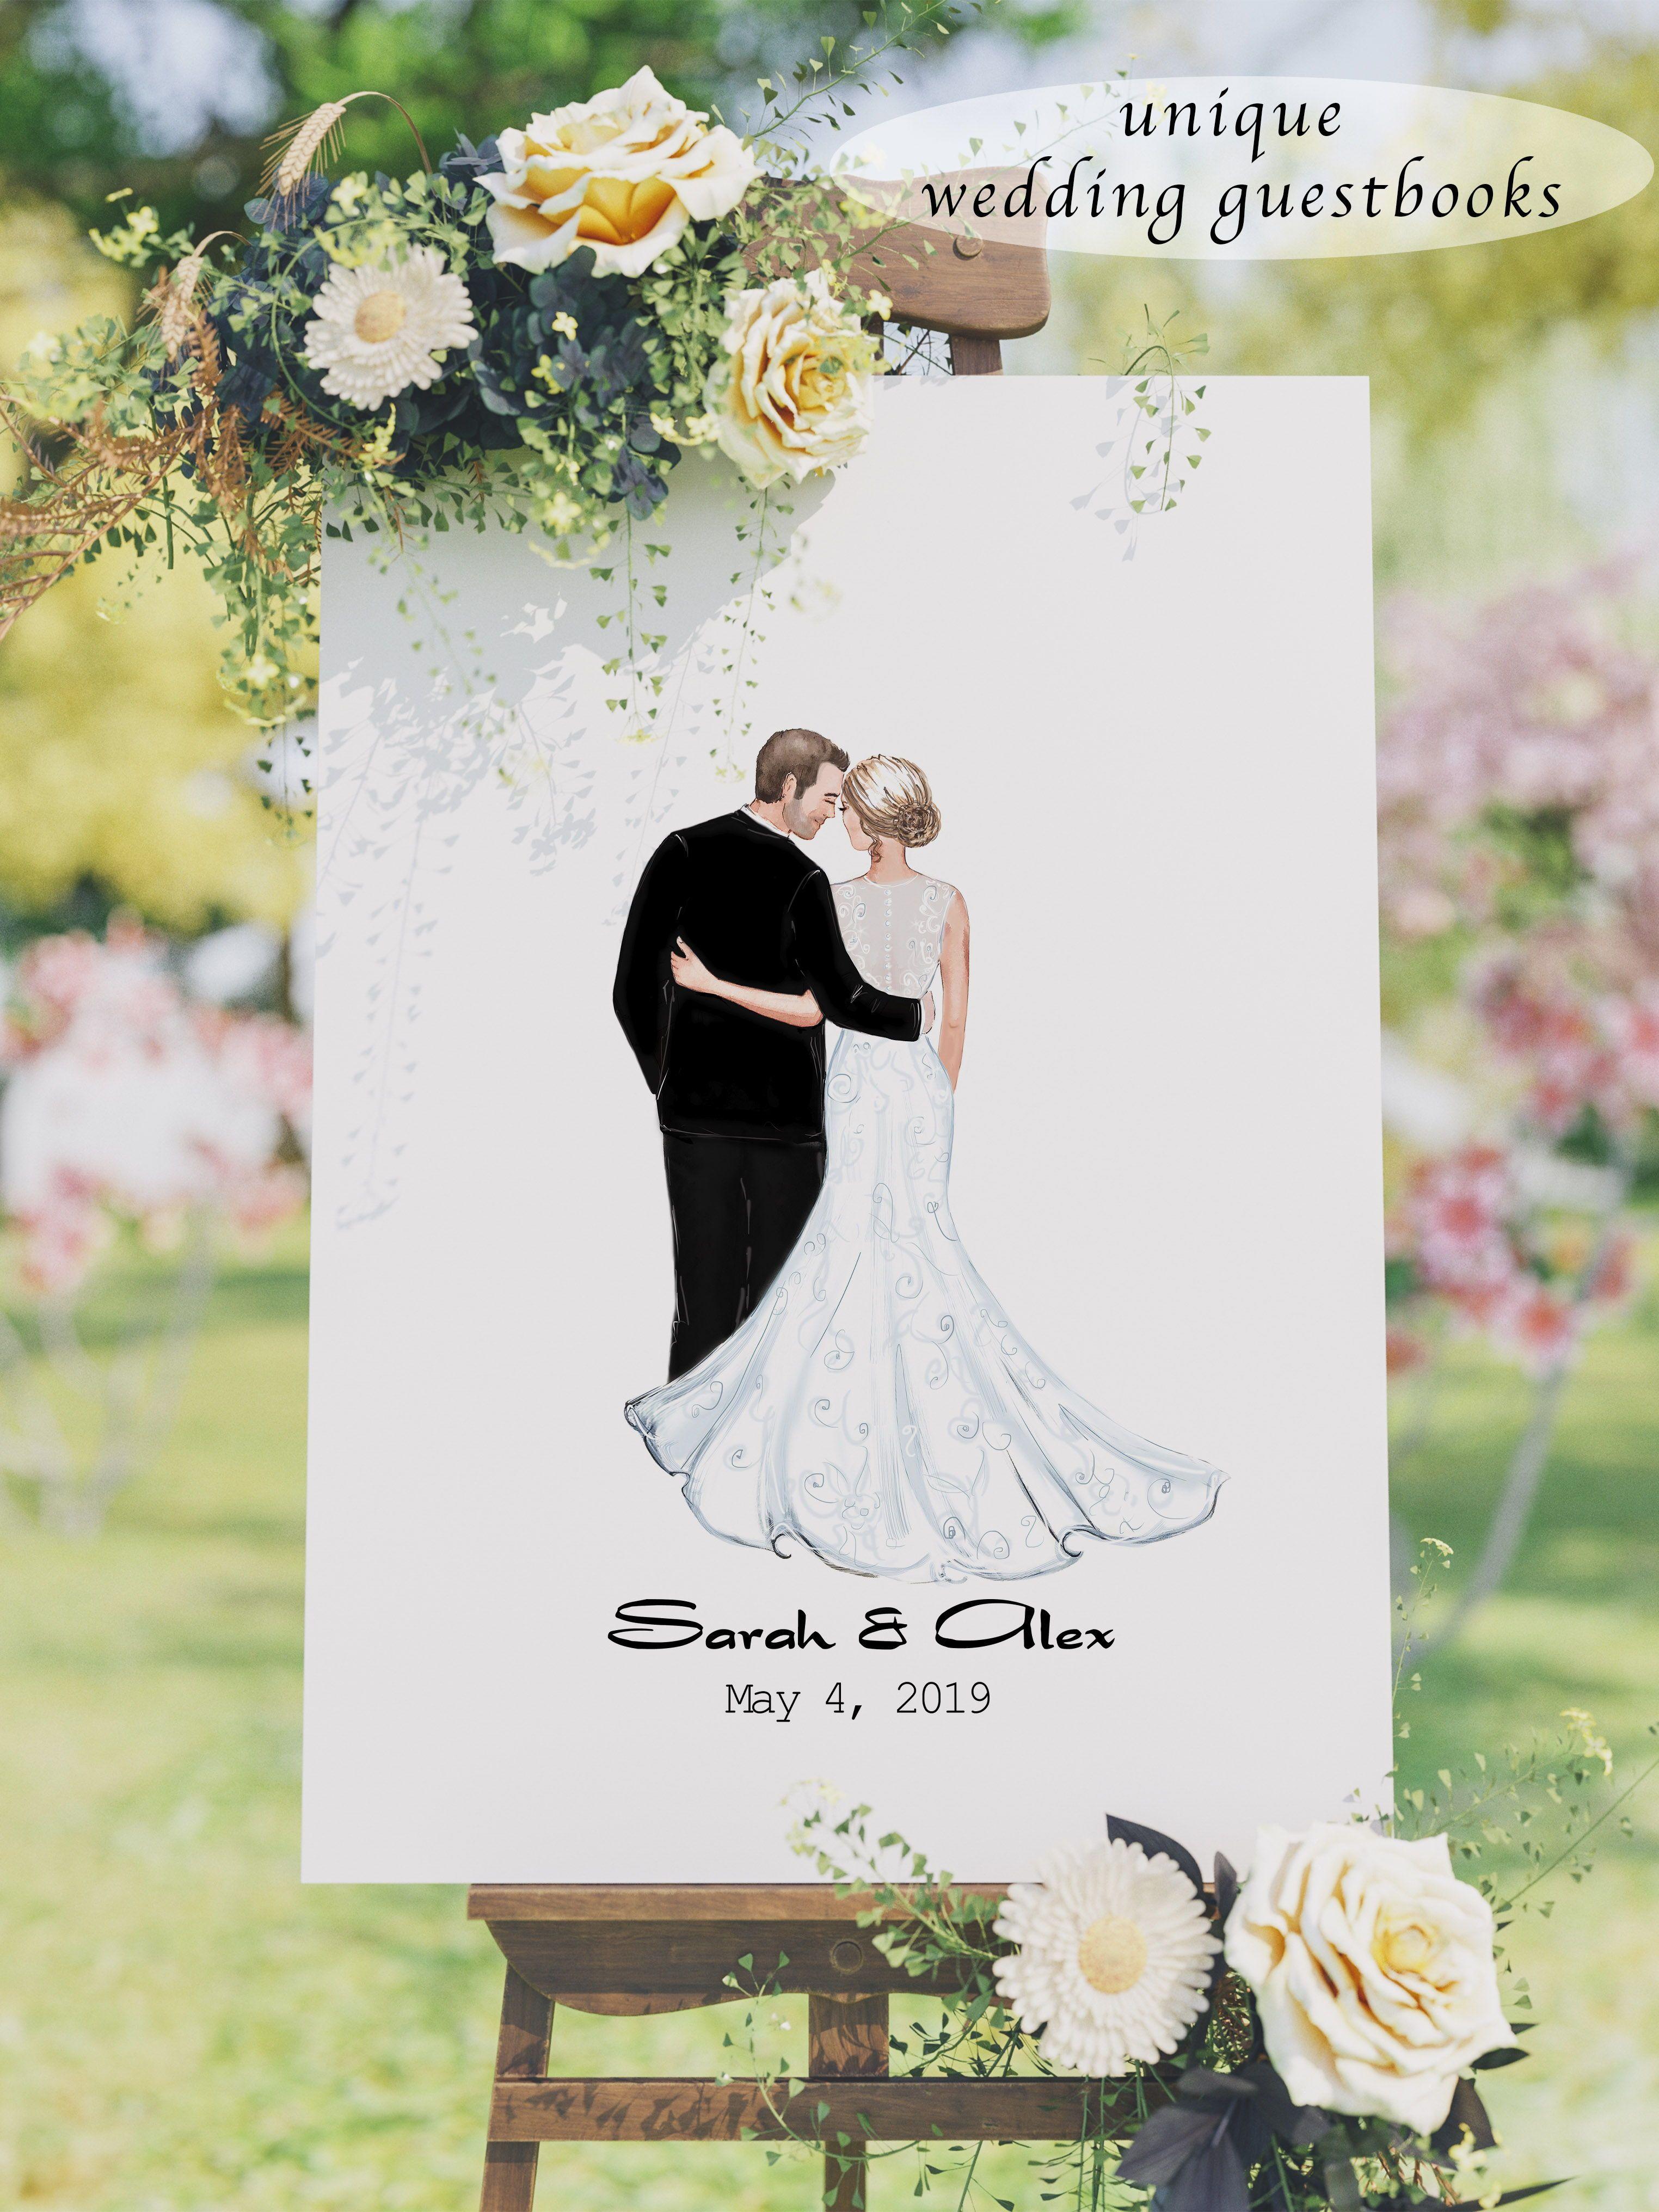 Wedding Guest Book Alternative Unique Wedding Guestbook Etsy Wedding Guest Book Unique Wedding Guest Book Personalized Wedding Guest Book